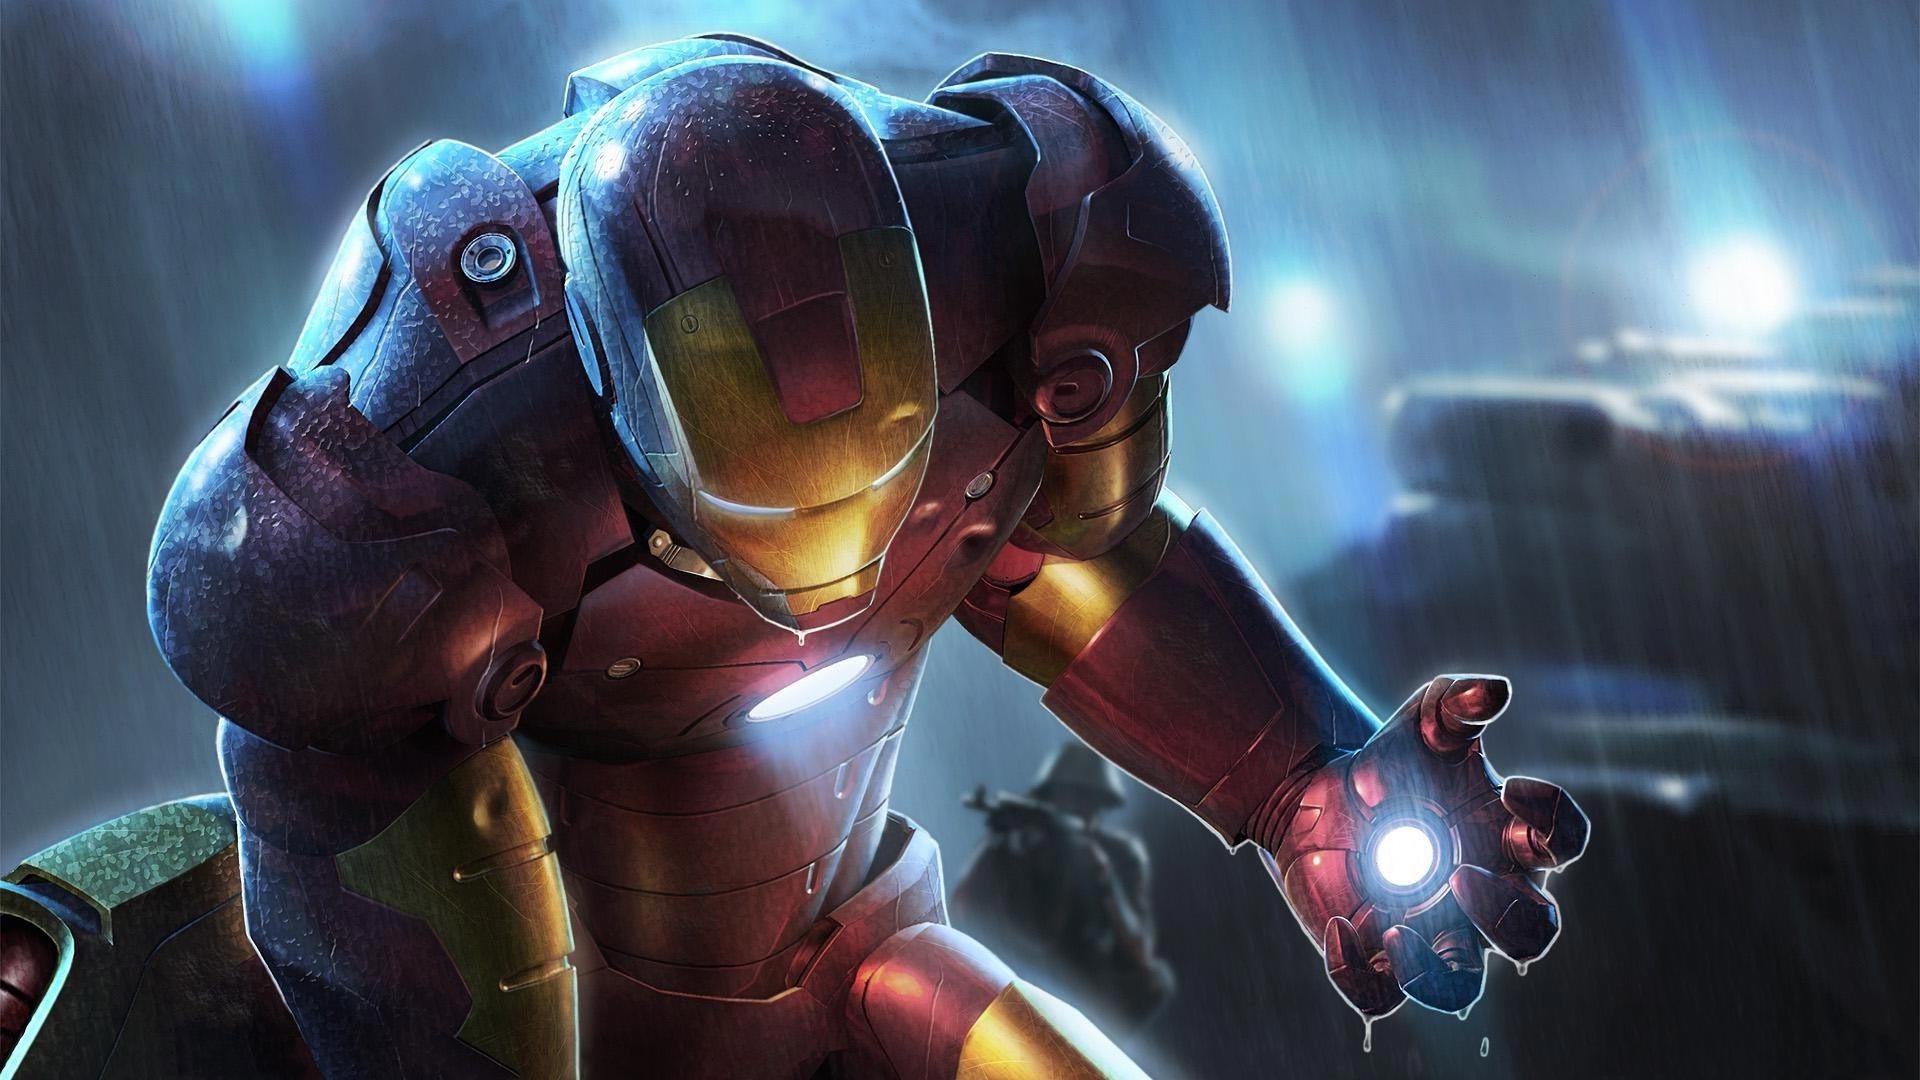 Iron Man wallpaper 1068 1920x1080